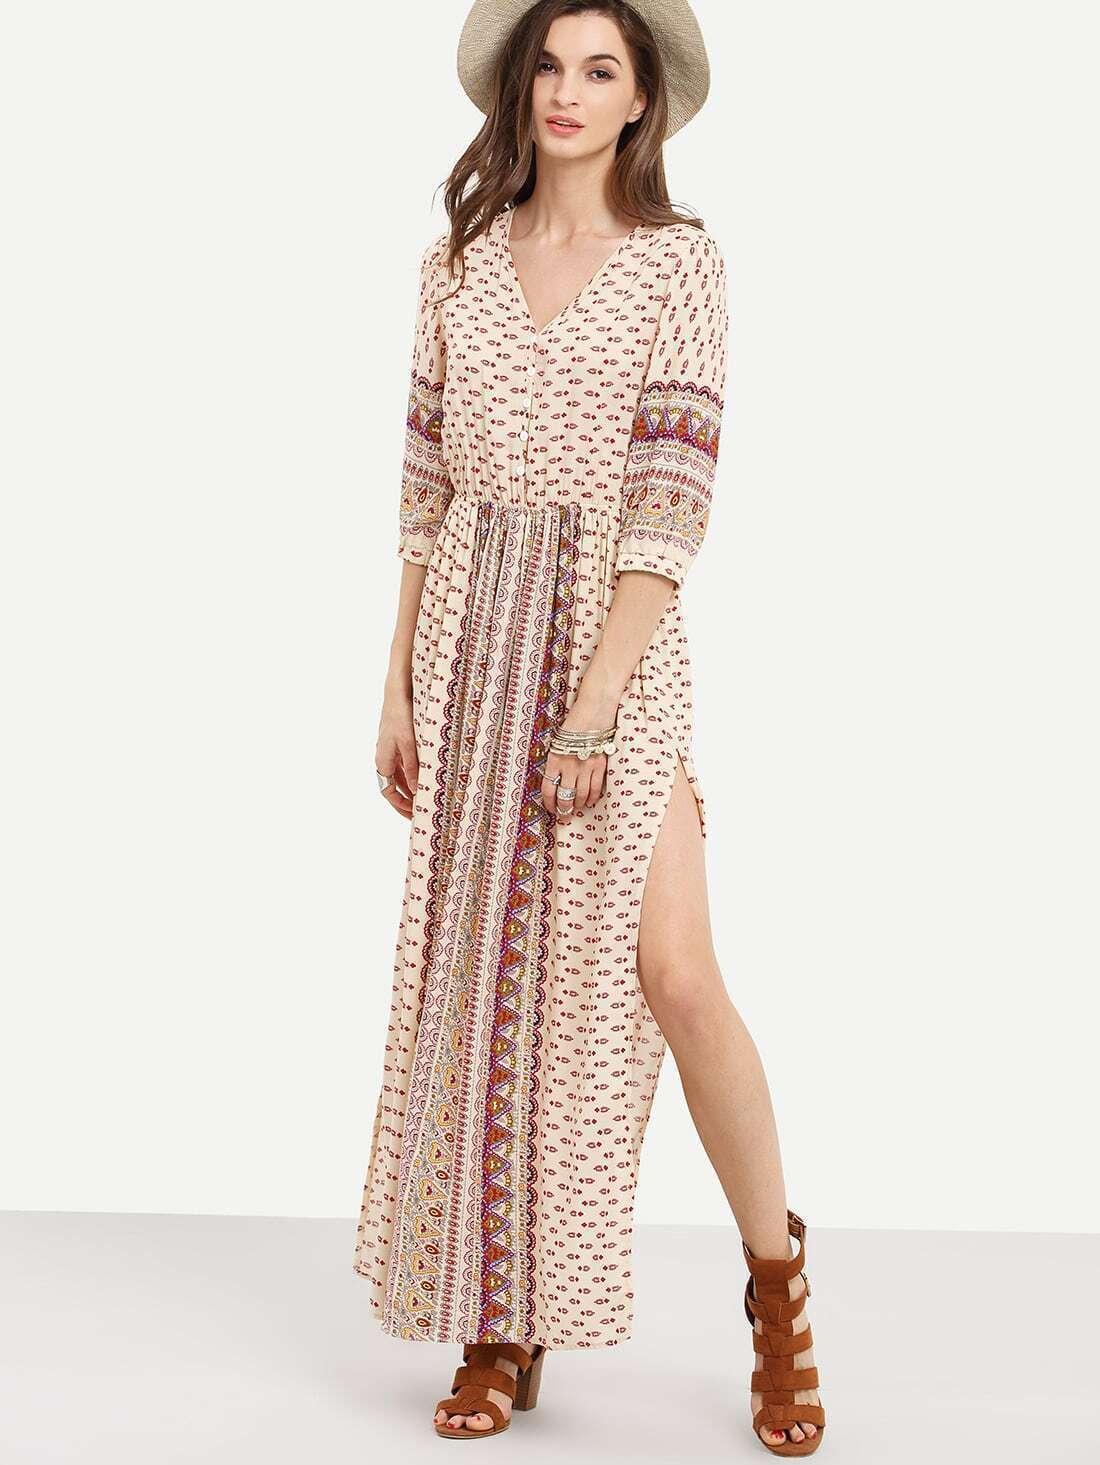 759b3fada789 Apricot Half Sleeve Vintage Print Split Maxi Dress EmmaCloth-Women ...